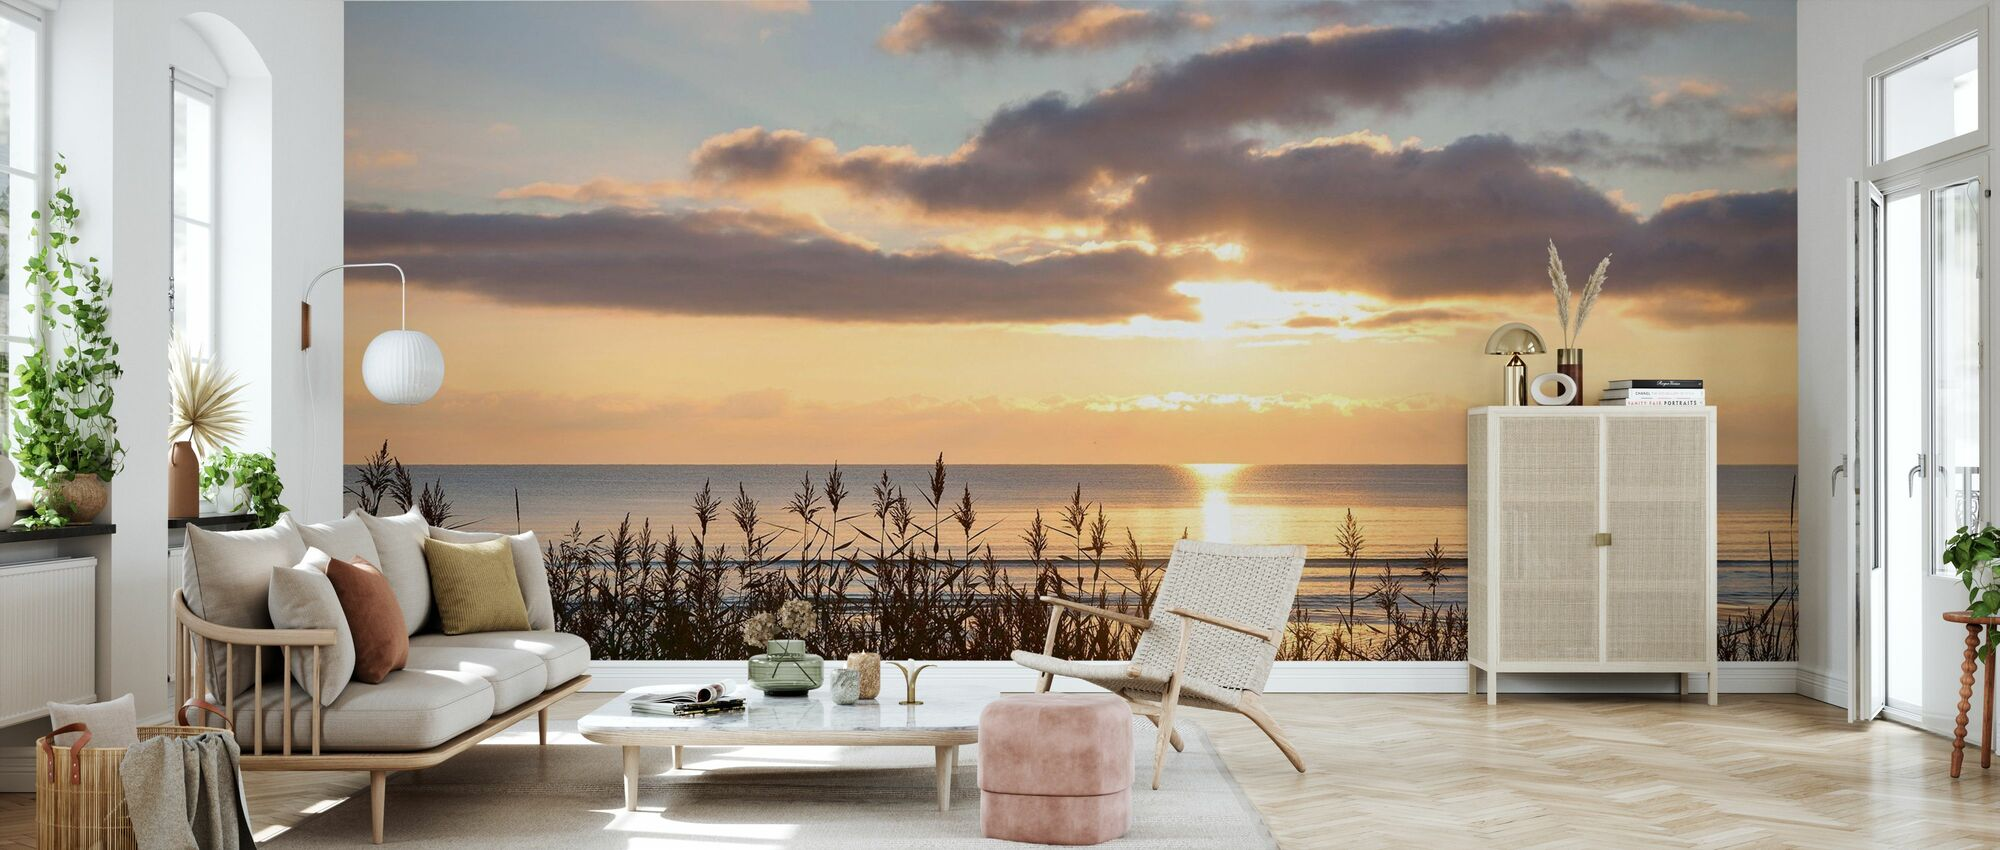 Ruoho ja auringonlasku - Gotland - Tapetti - Olohuone